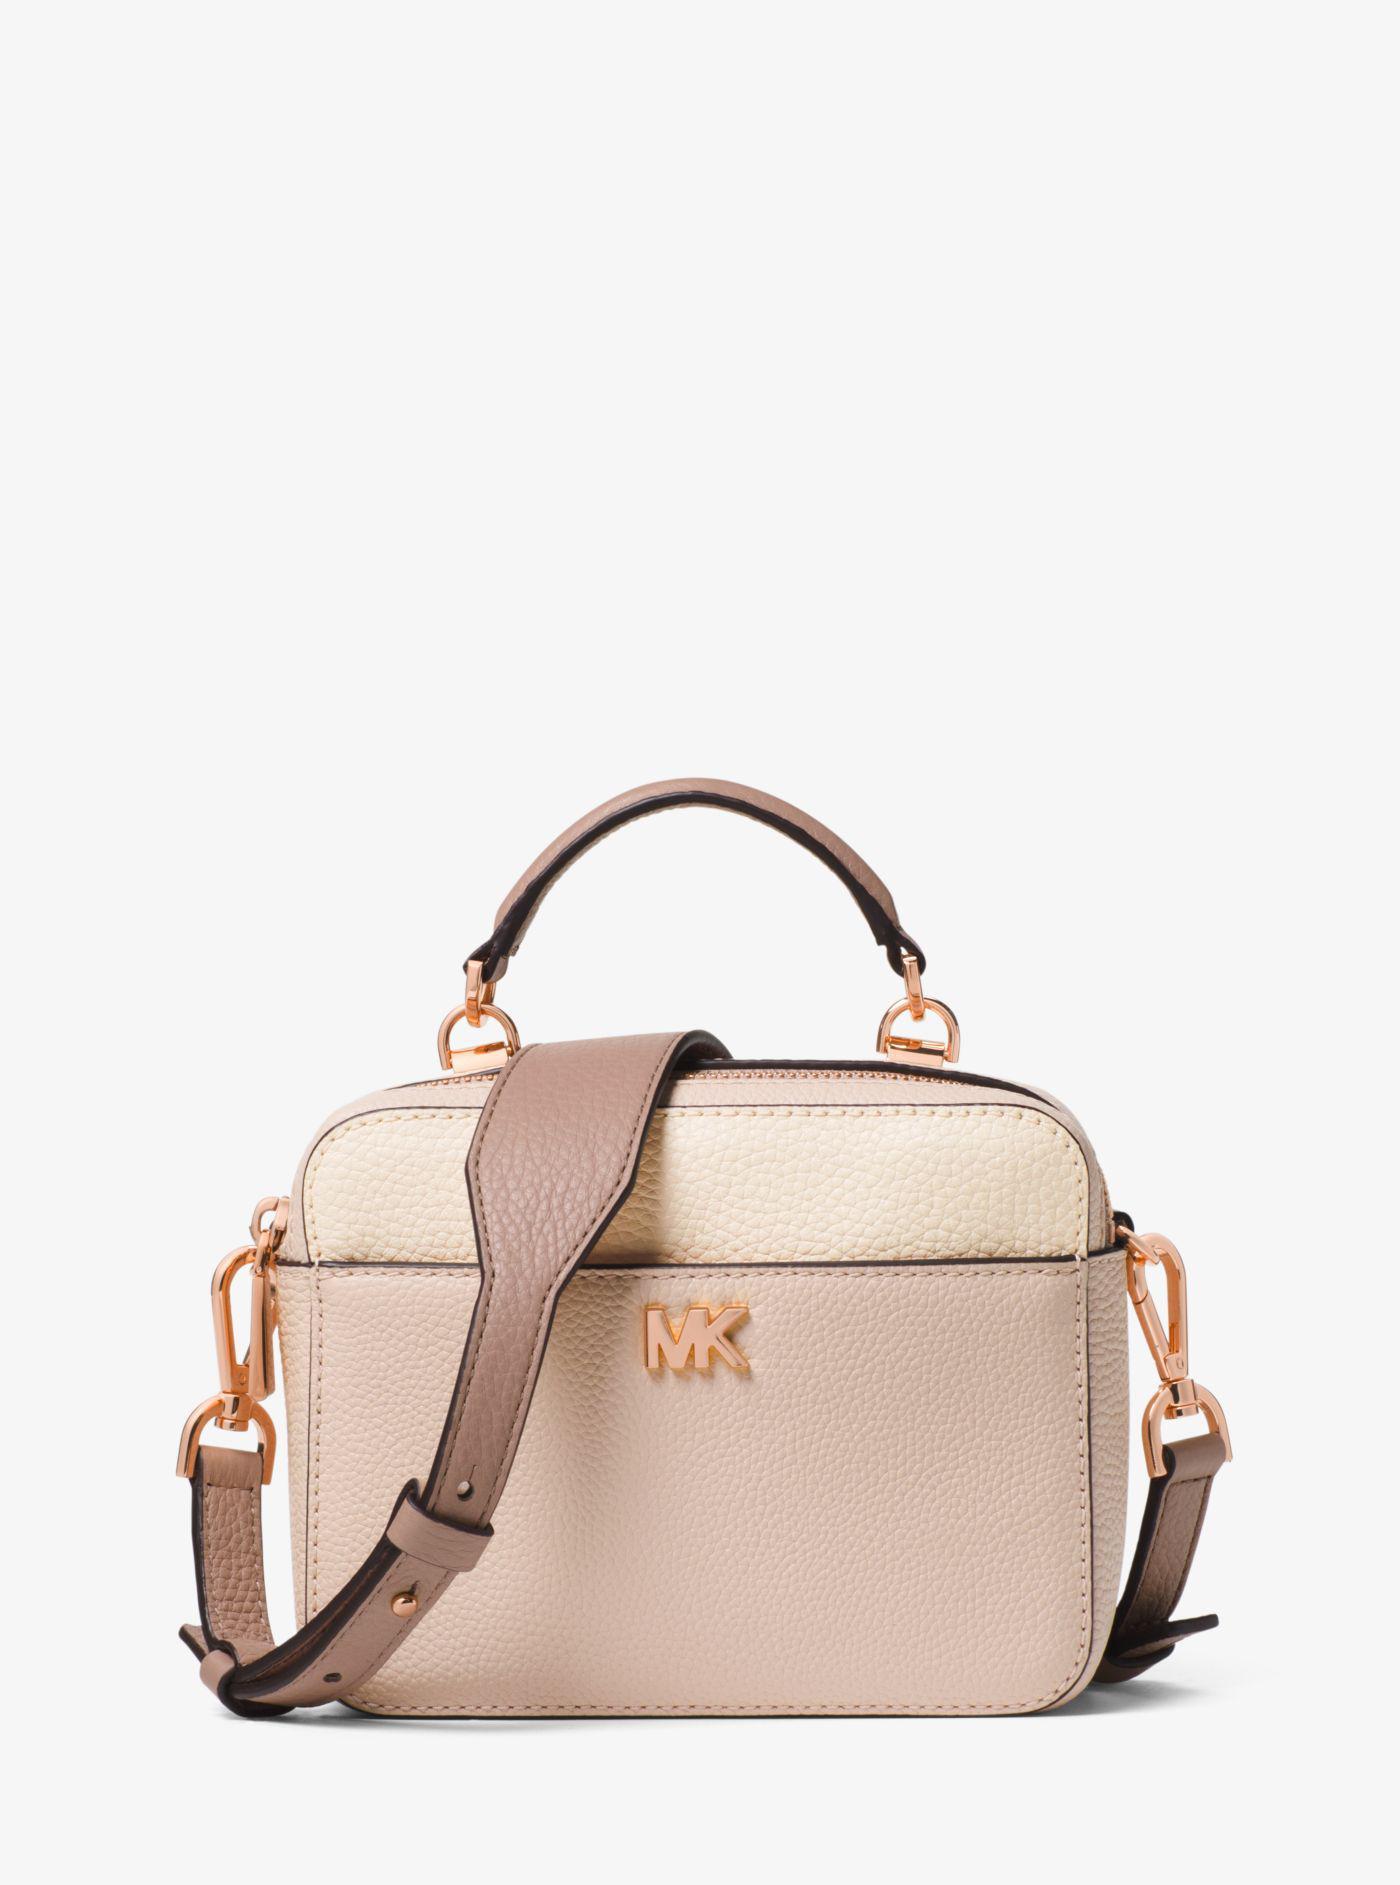 a26c037798b323 Michael Kors Mott Mini Color-block Pebbled Leather Crossbody - Lyst